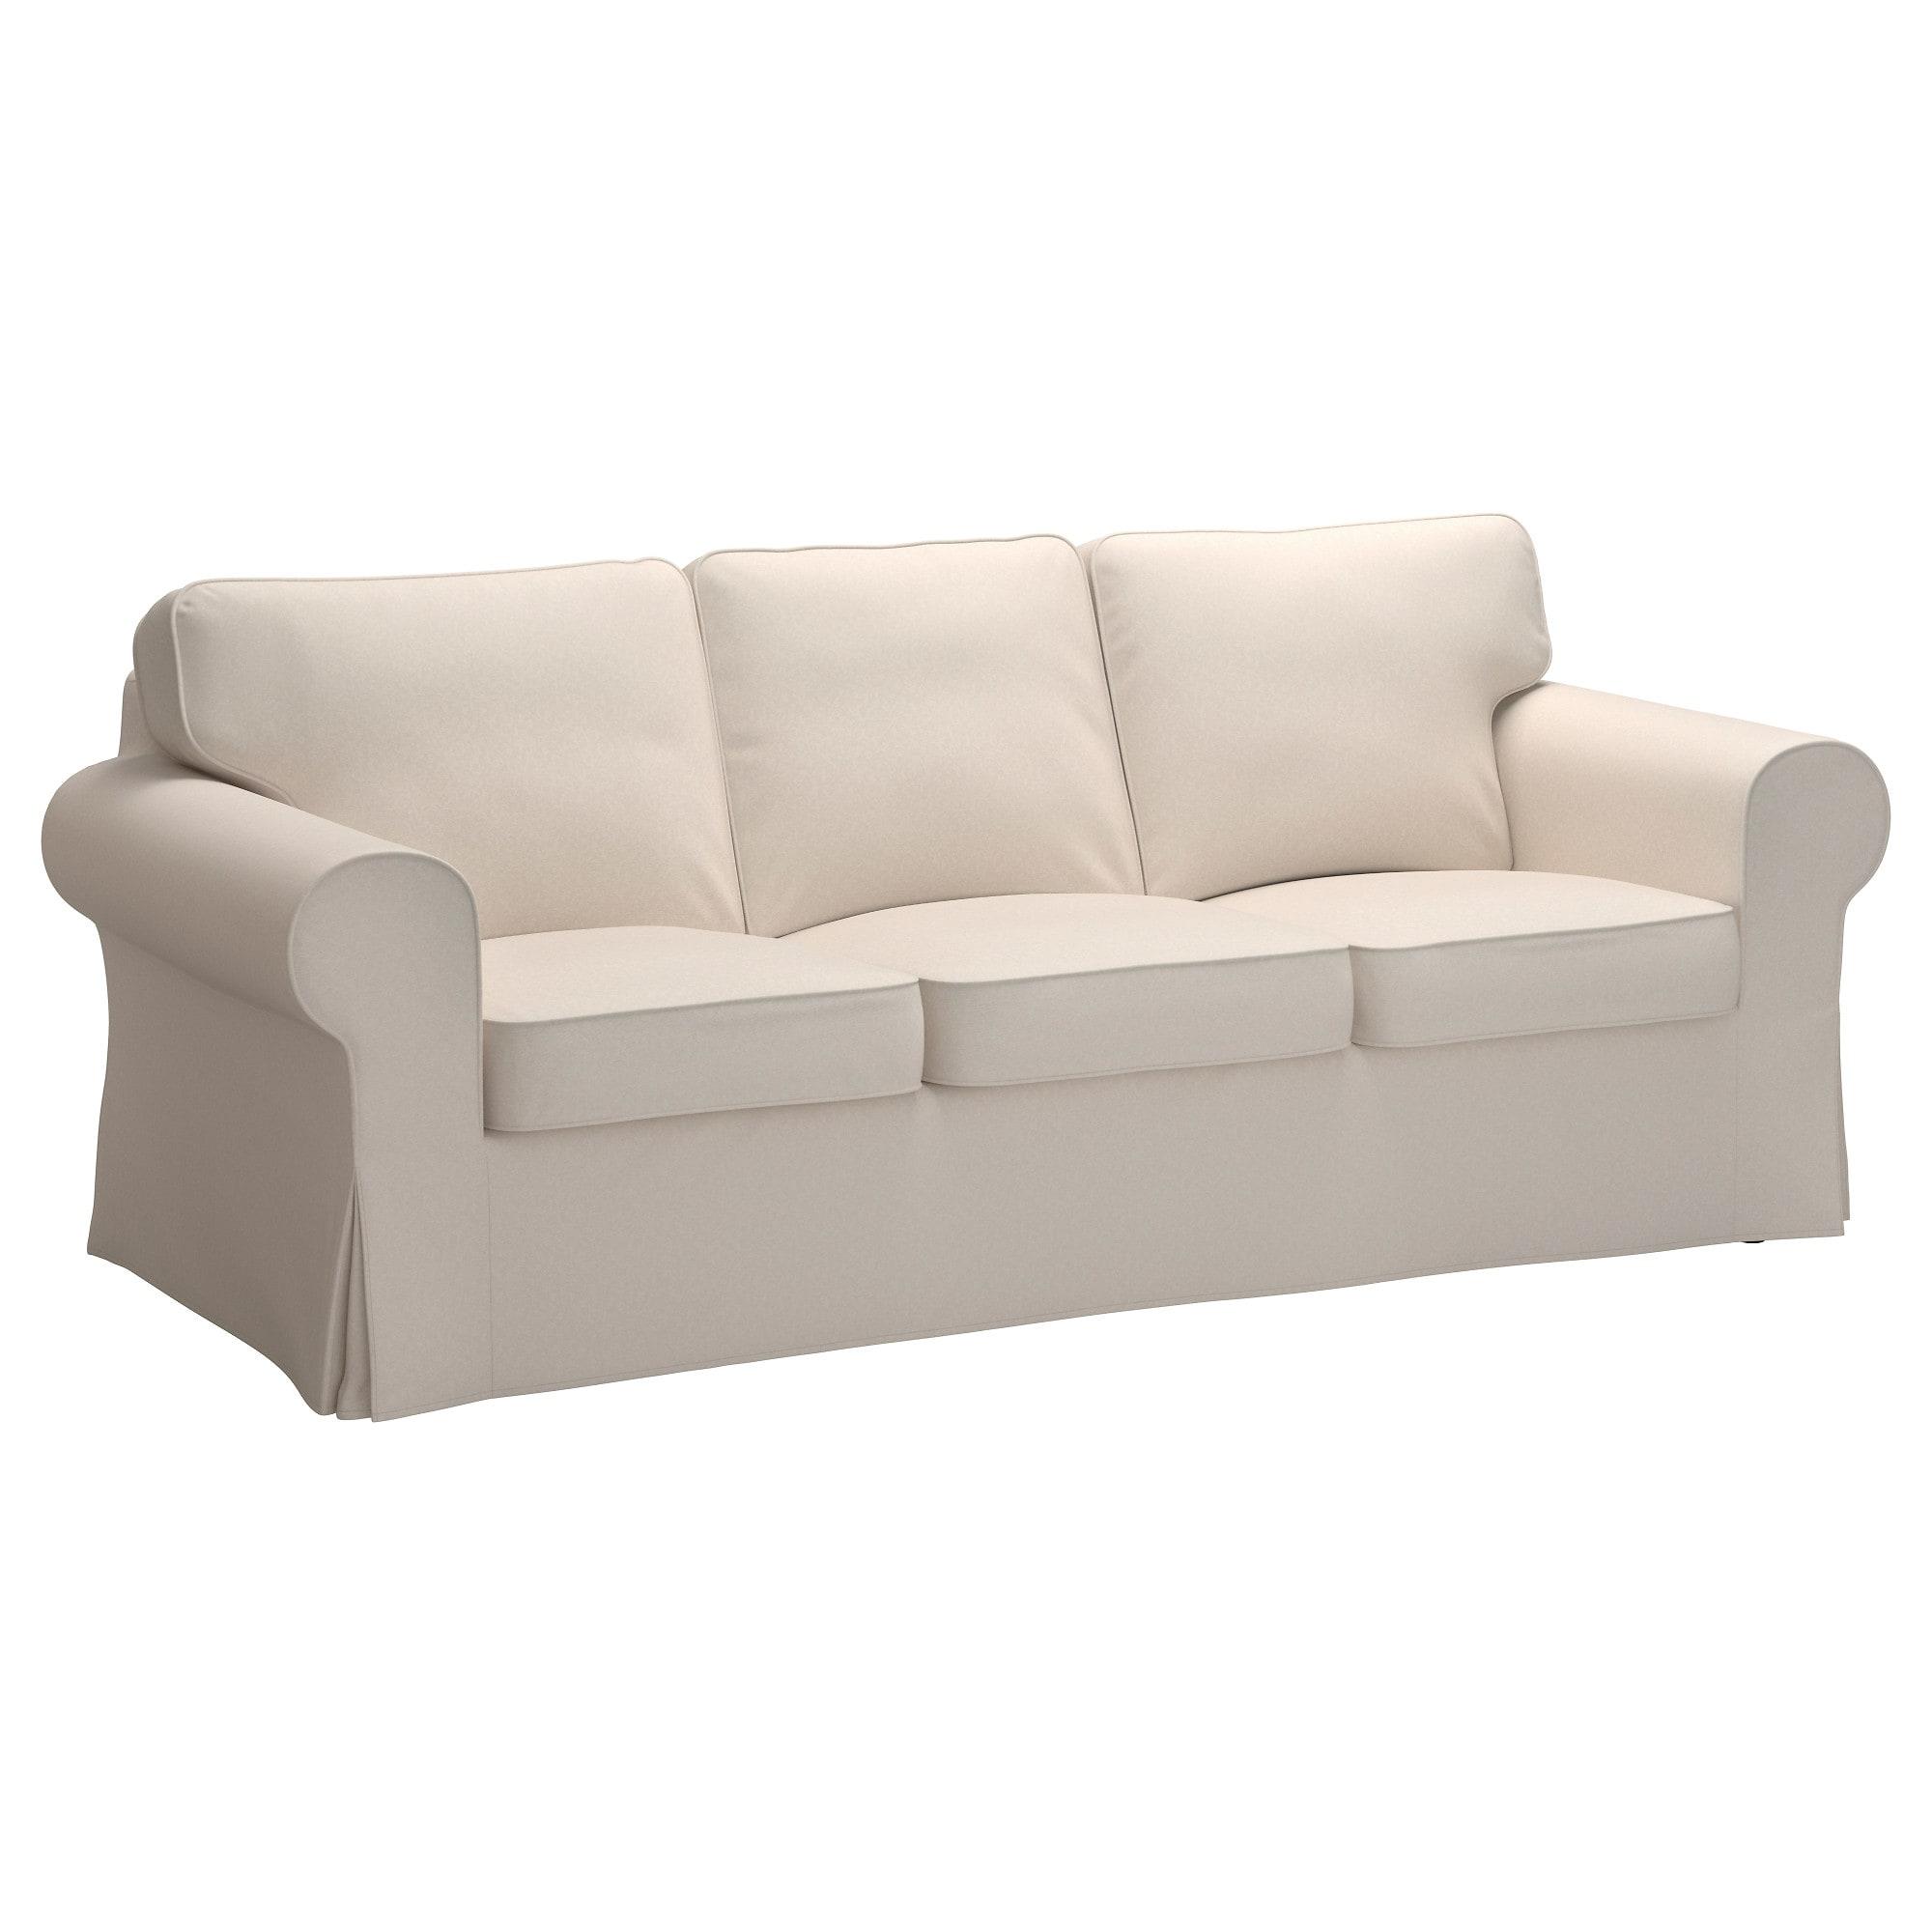 Sofas Baratos Ikea Nkde sofà S Y Sillones Pra Online Ikea